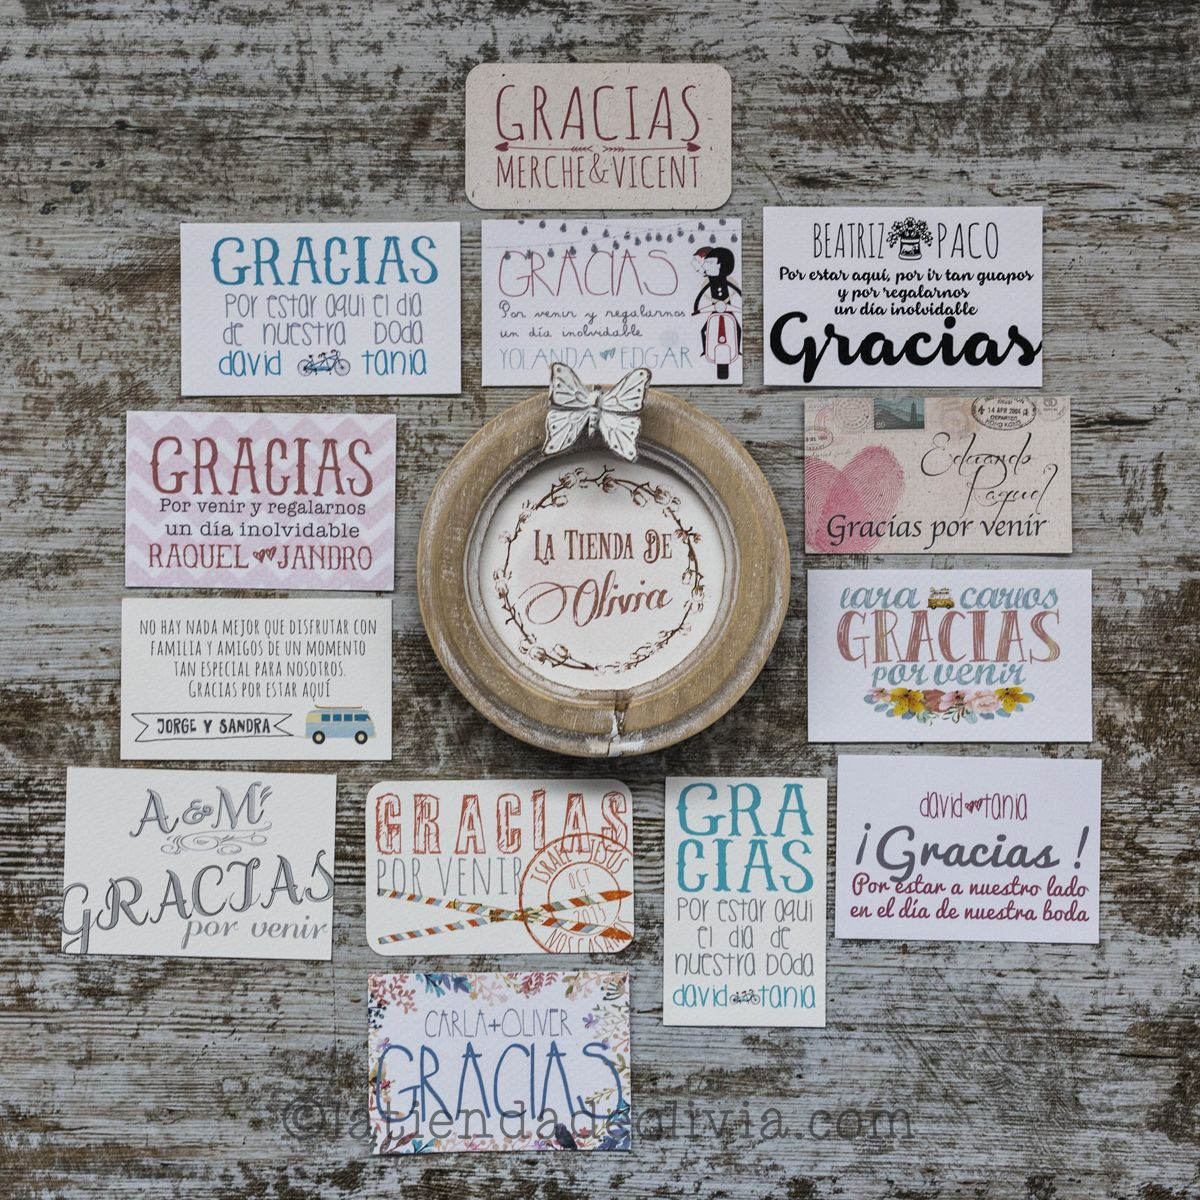 tarjetas de agradecimiento para bodas la tienda de olivia